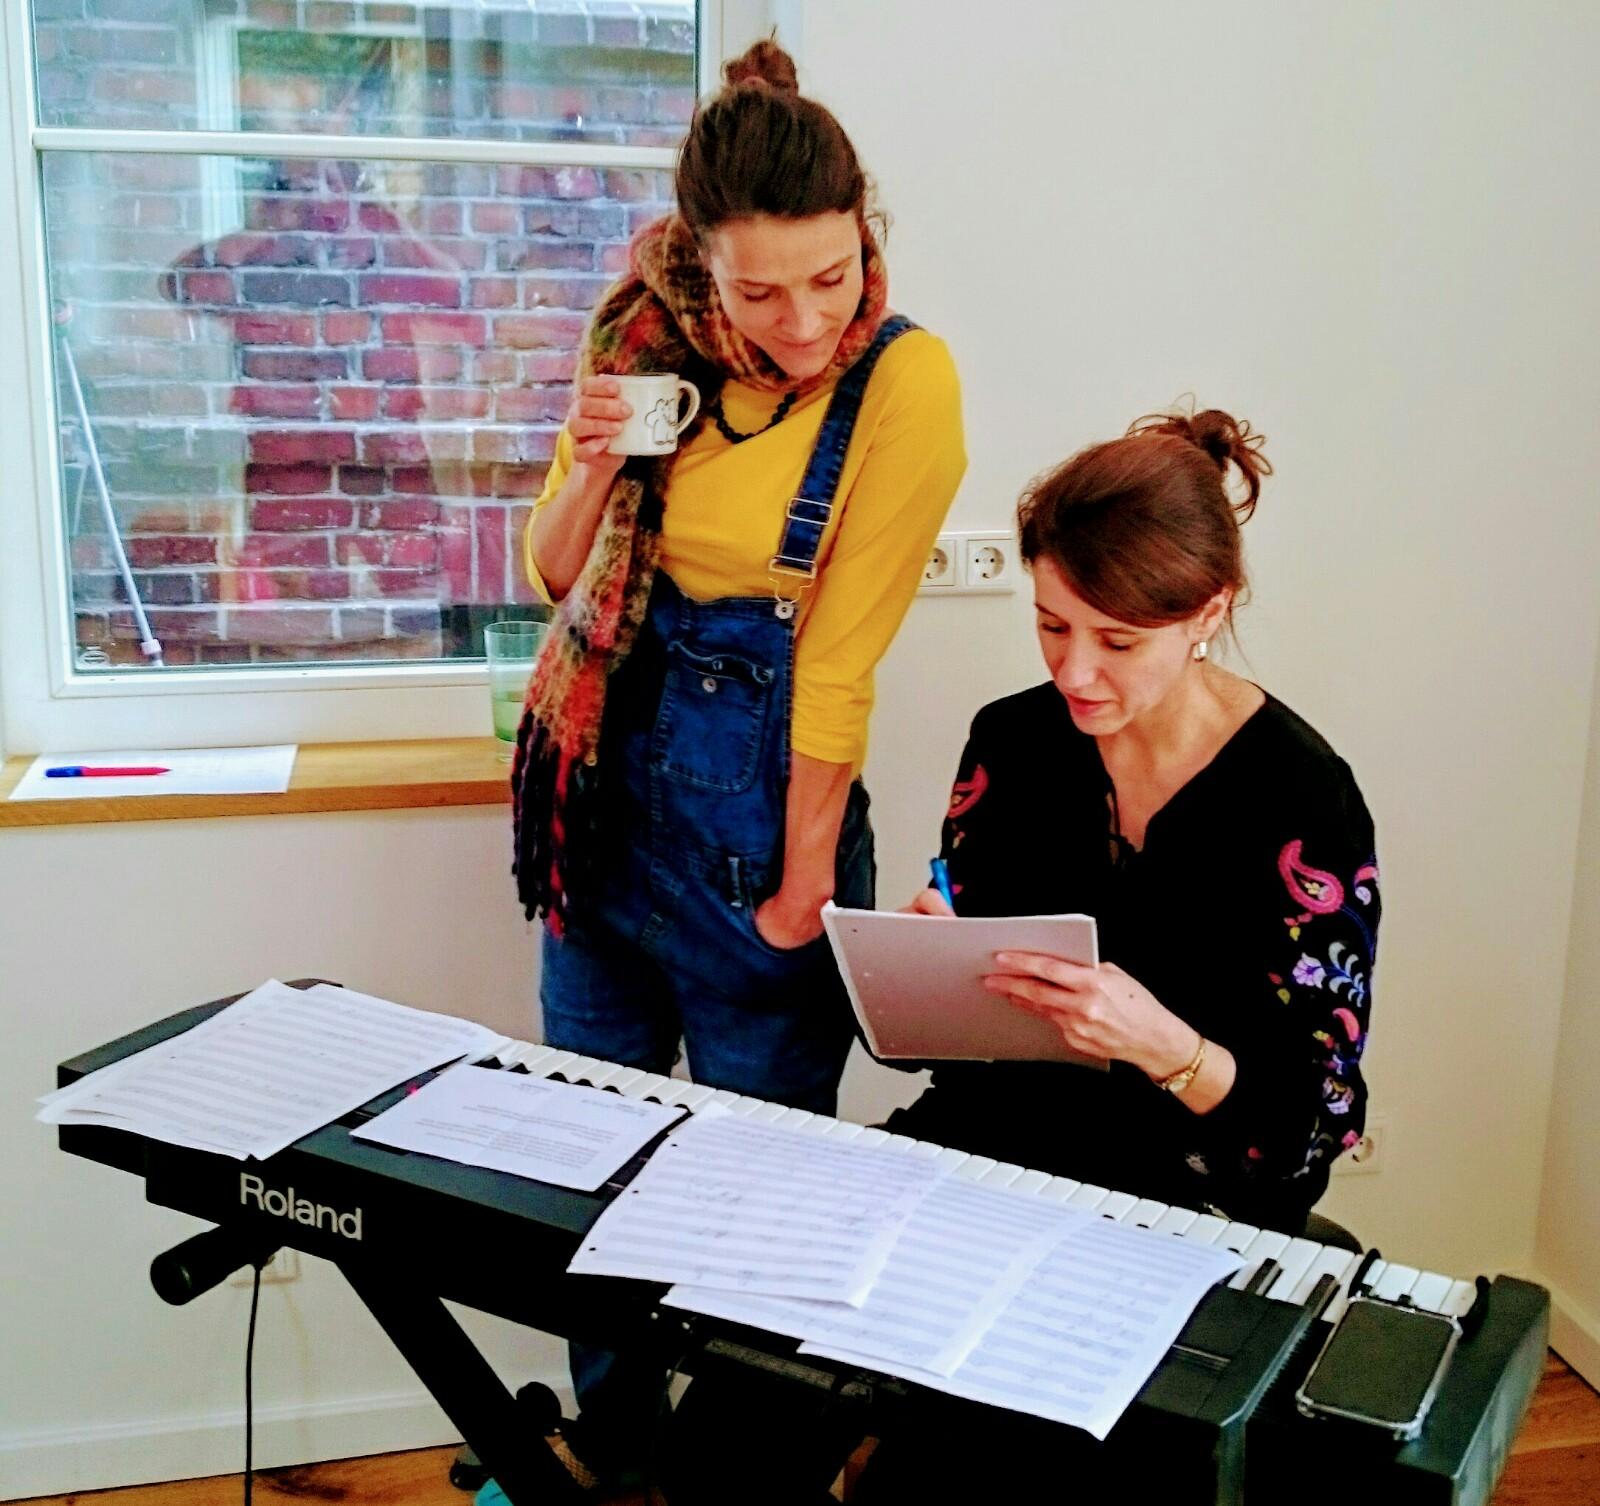 Fjarill, Duo, Hamburg, Pop, Hanmari Spiegel, Aino Löwenmark, Walden Studio, Midsommar, music, producing, Workshop, Songwriting, voice, coaching, singing, violin, piano, texting